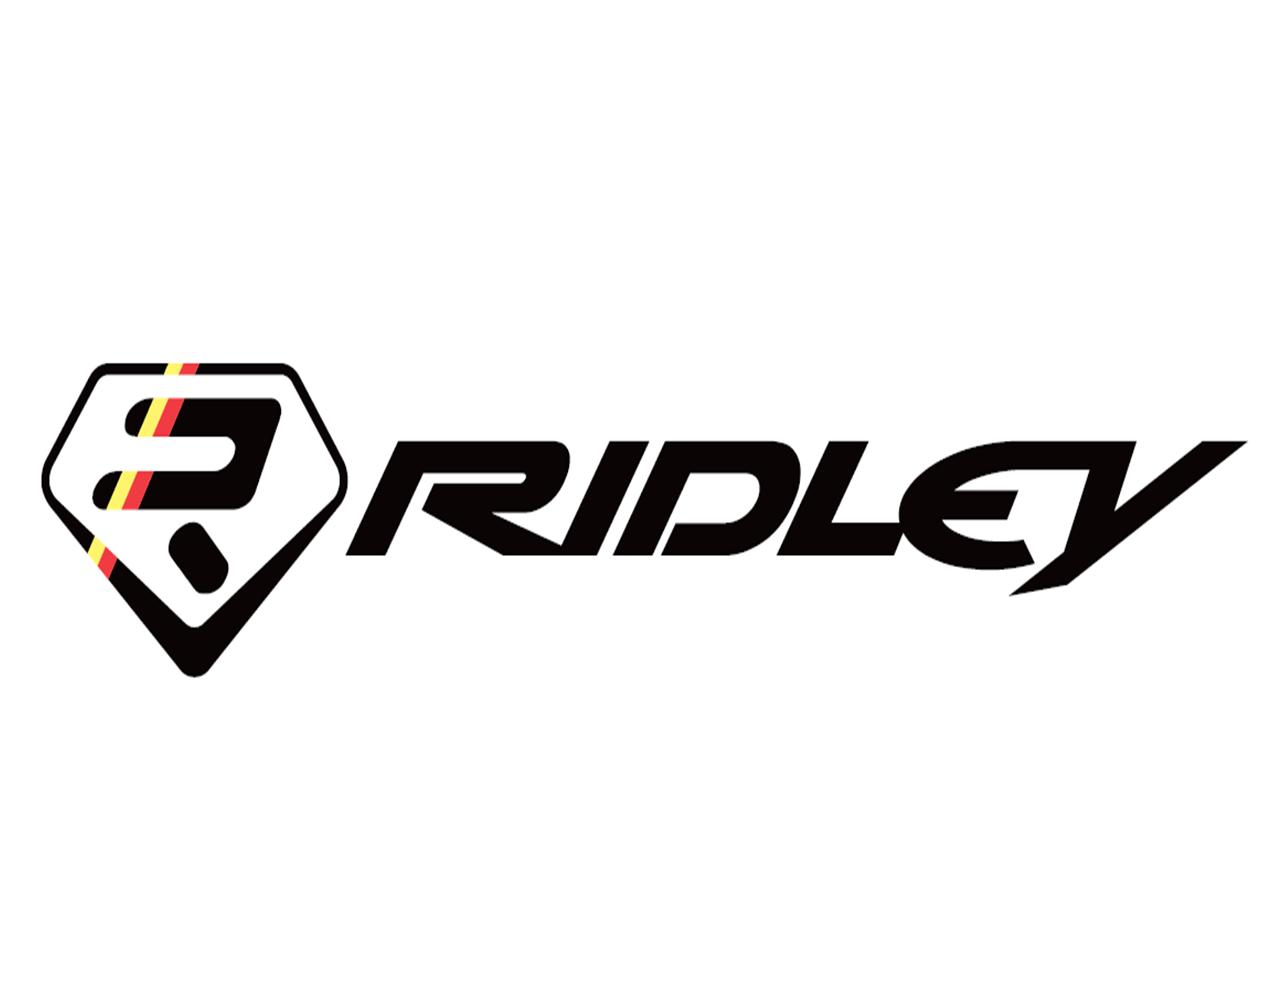 Old Bicycle Brand Logos